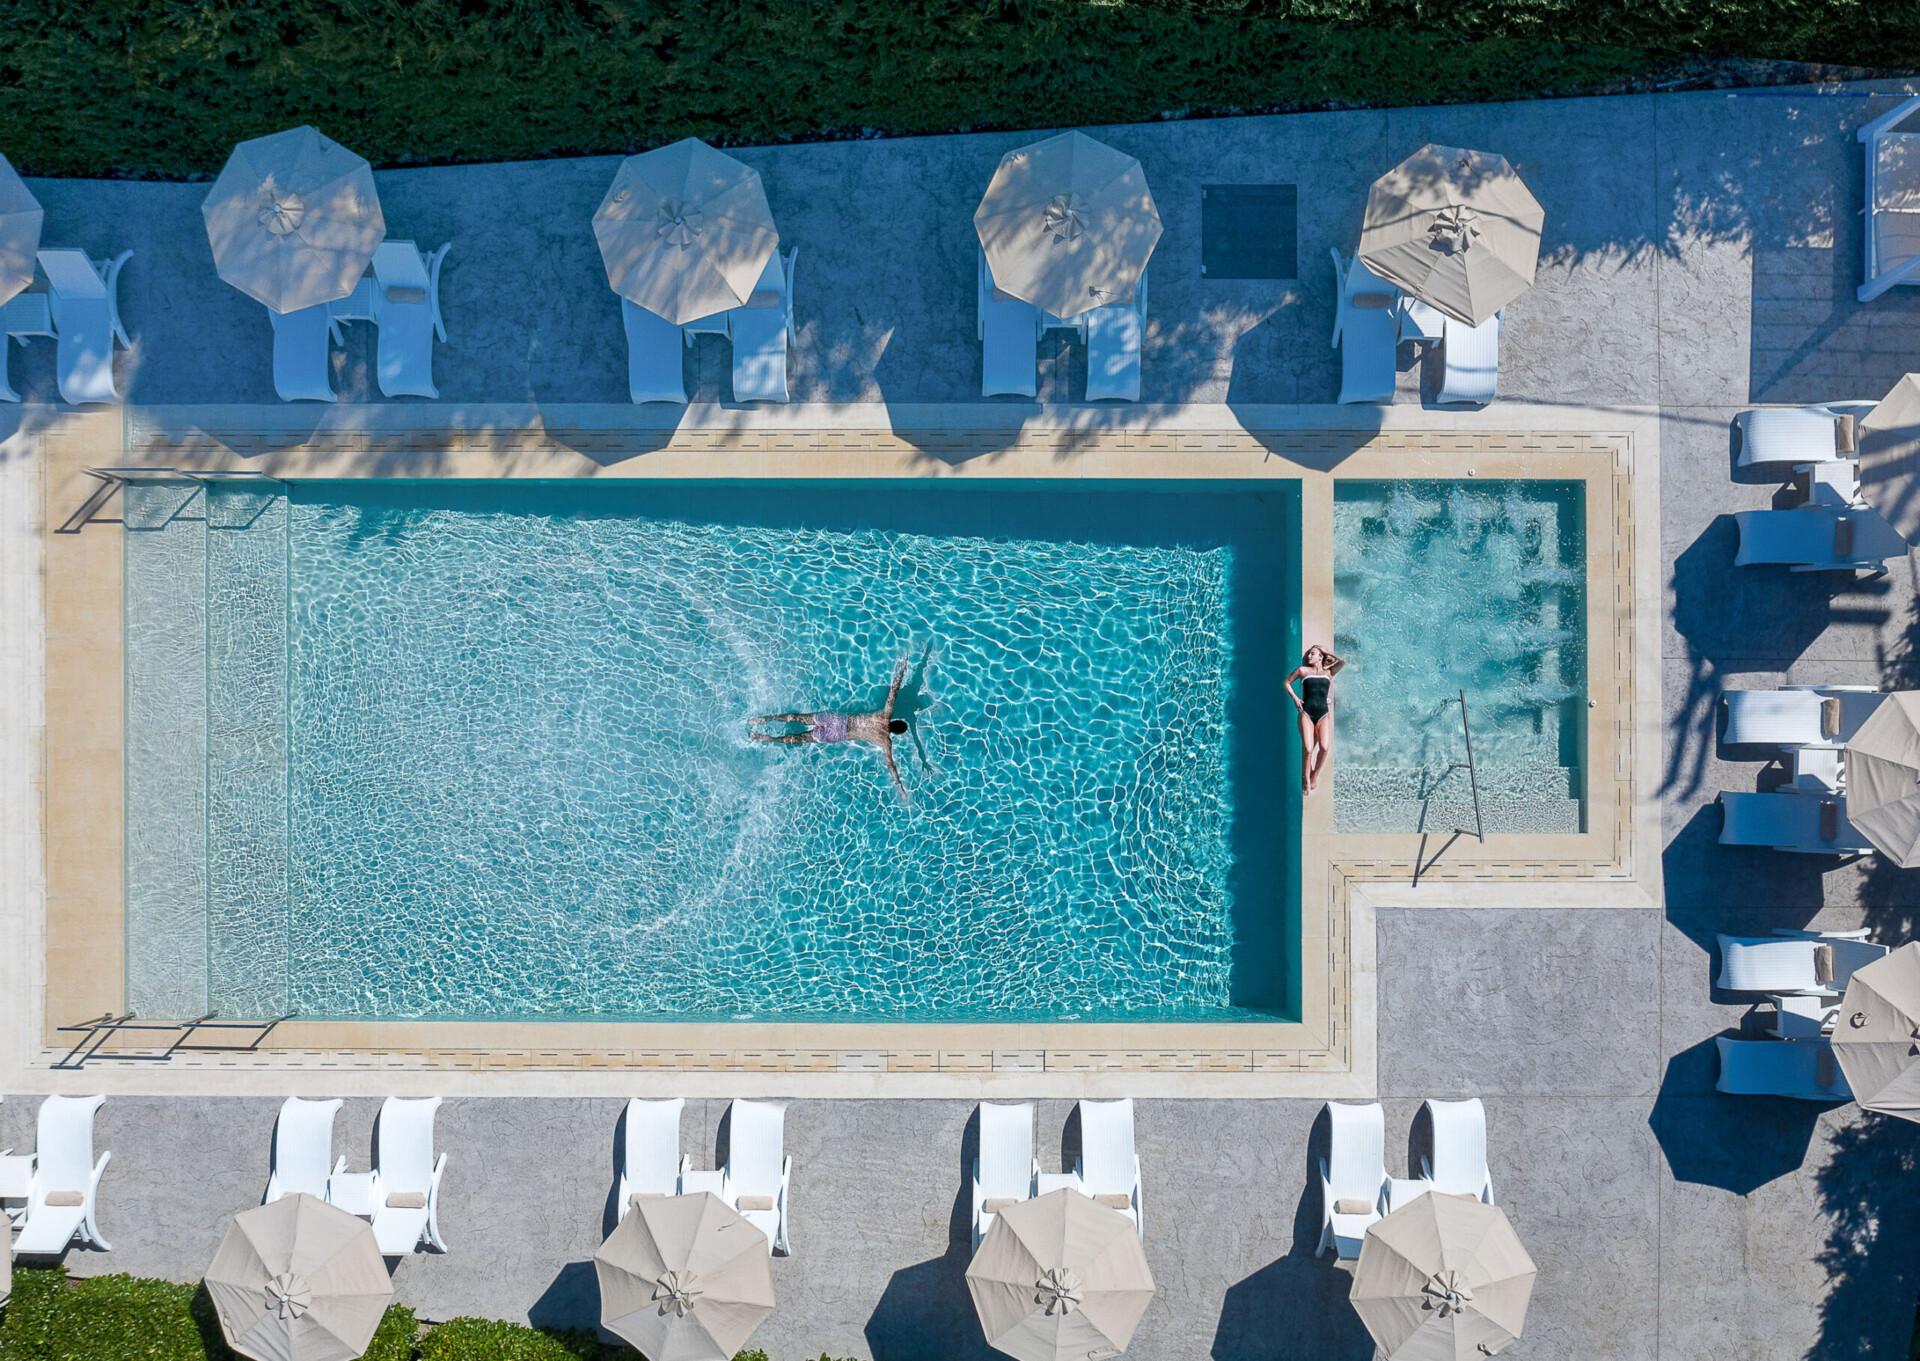 4* Marelen Hotel - Ζάκυνθος ✦ 2 Ημέρες (1 Διανυκτέρευση)